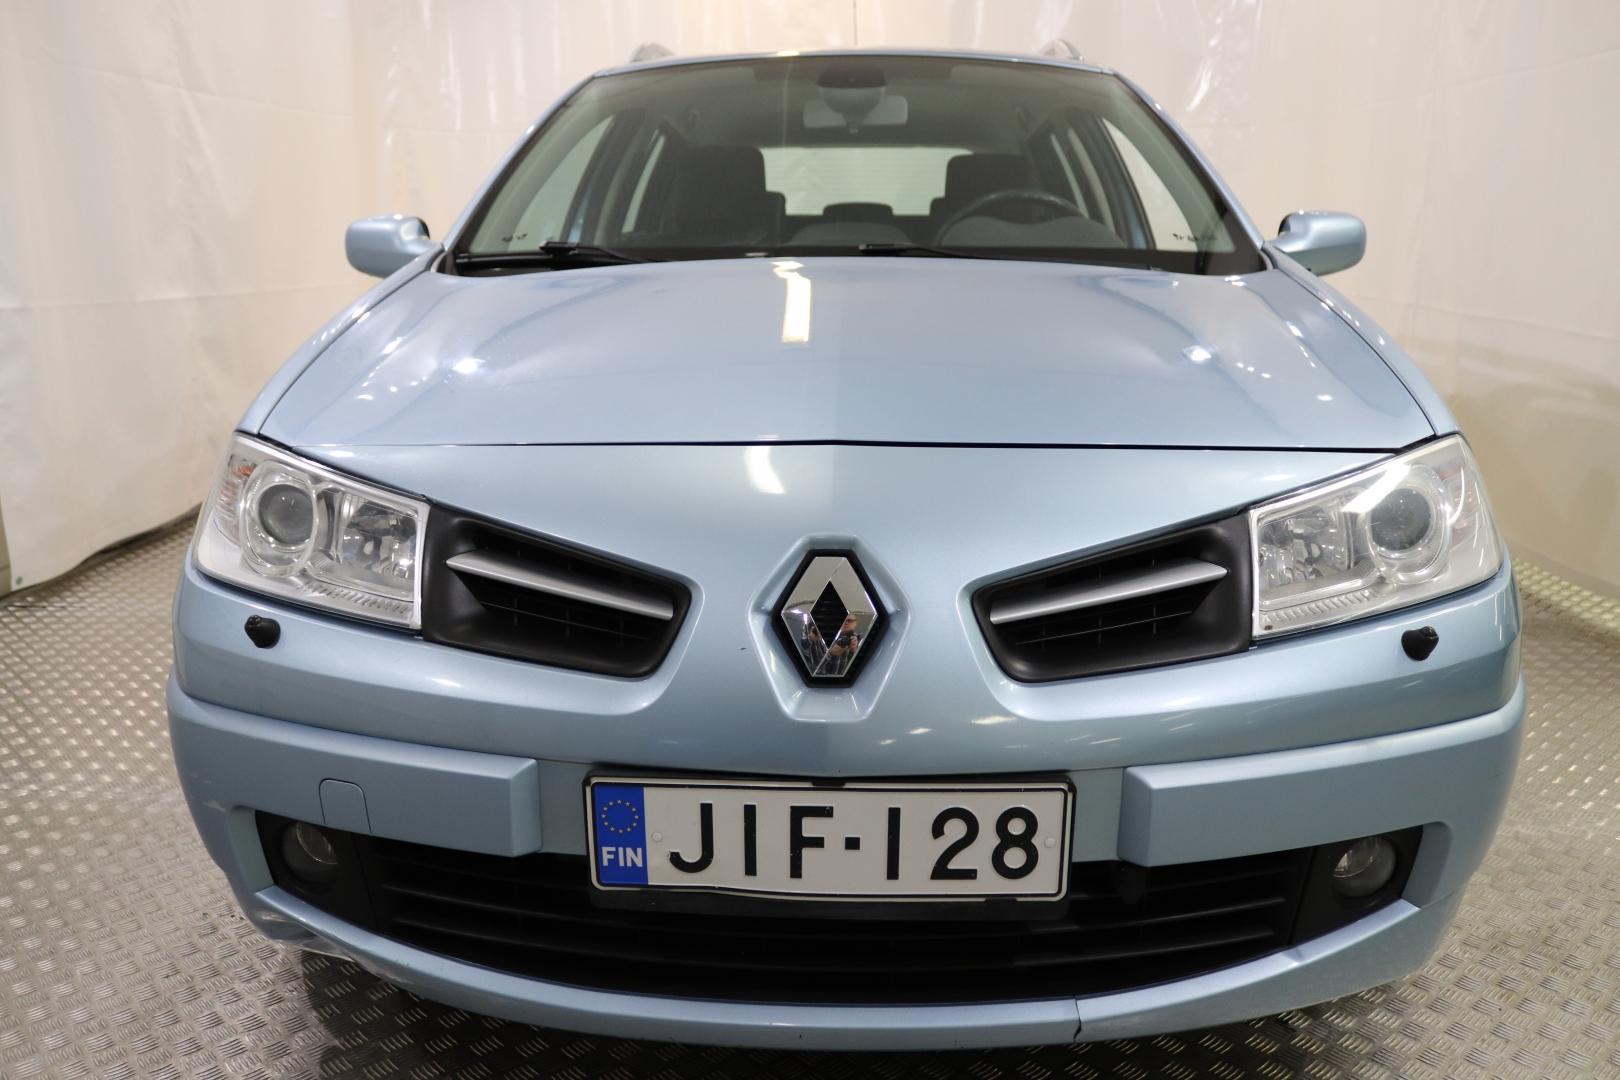 Renault Megane, Break 1.5 dCi 106 Expression